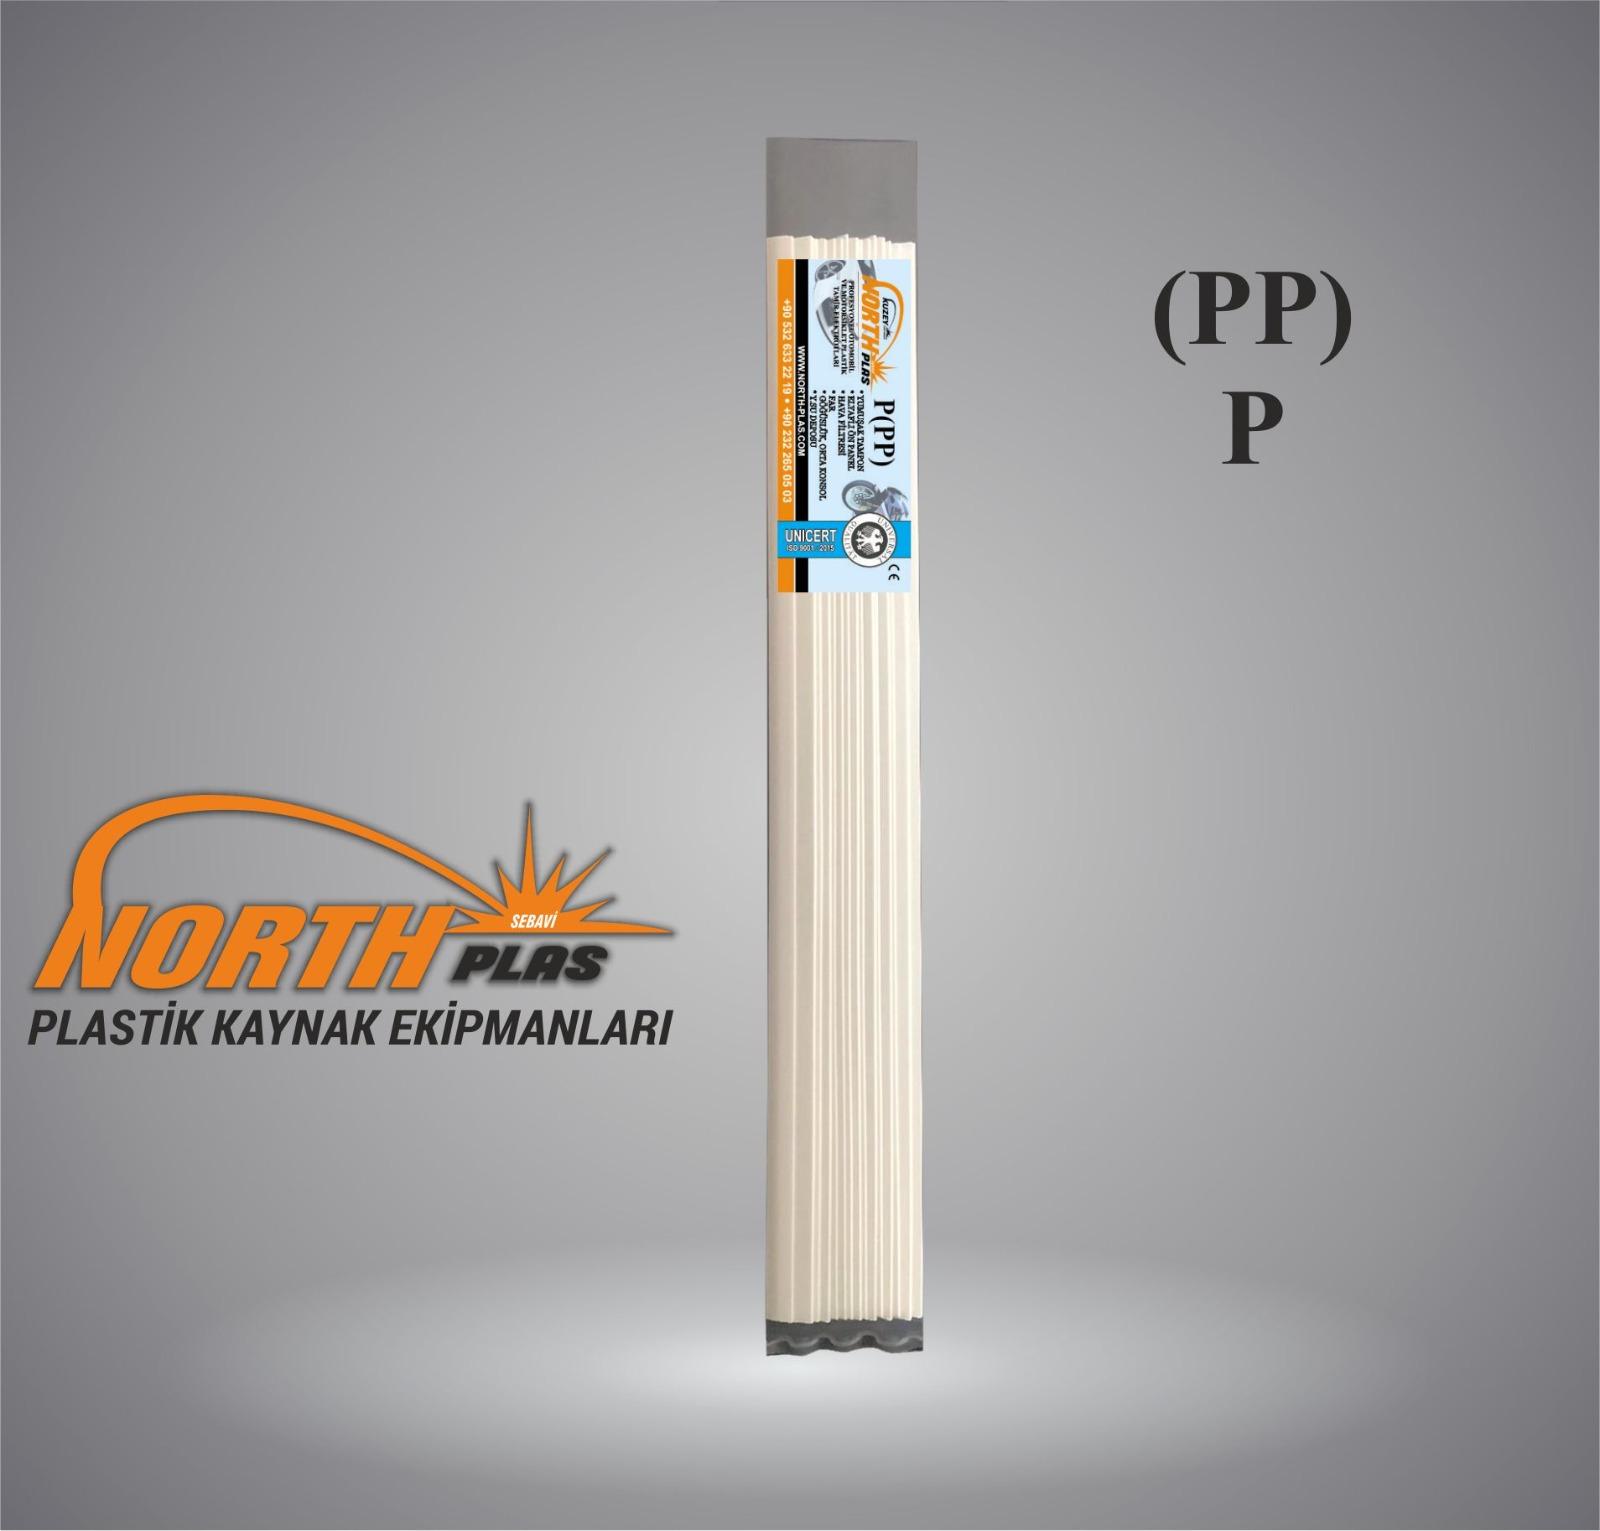 North Plas (PP) POLİPROPİLEN BEYAZ GENİŞ 12 MM  15 ADET PAKET İÇİ (YUMUŞAK PLASTİK) Plastik Kaynak Elektrot